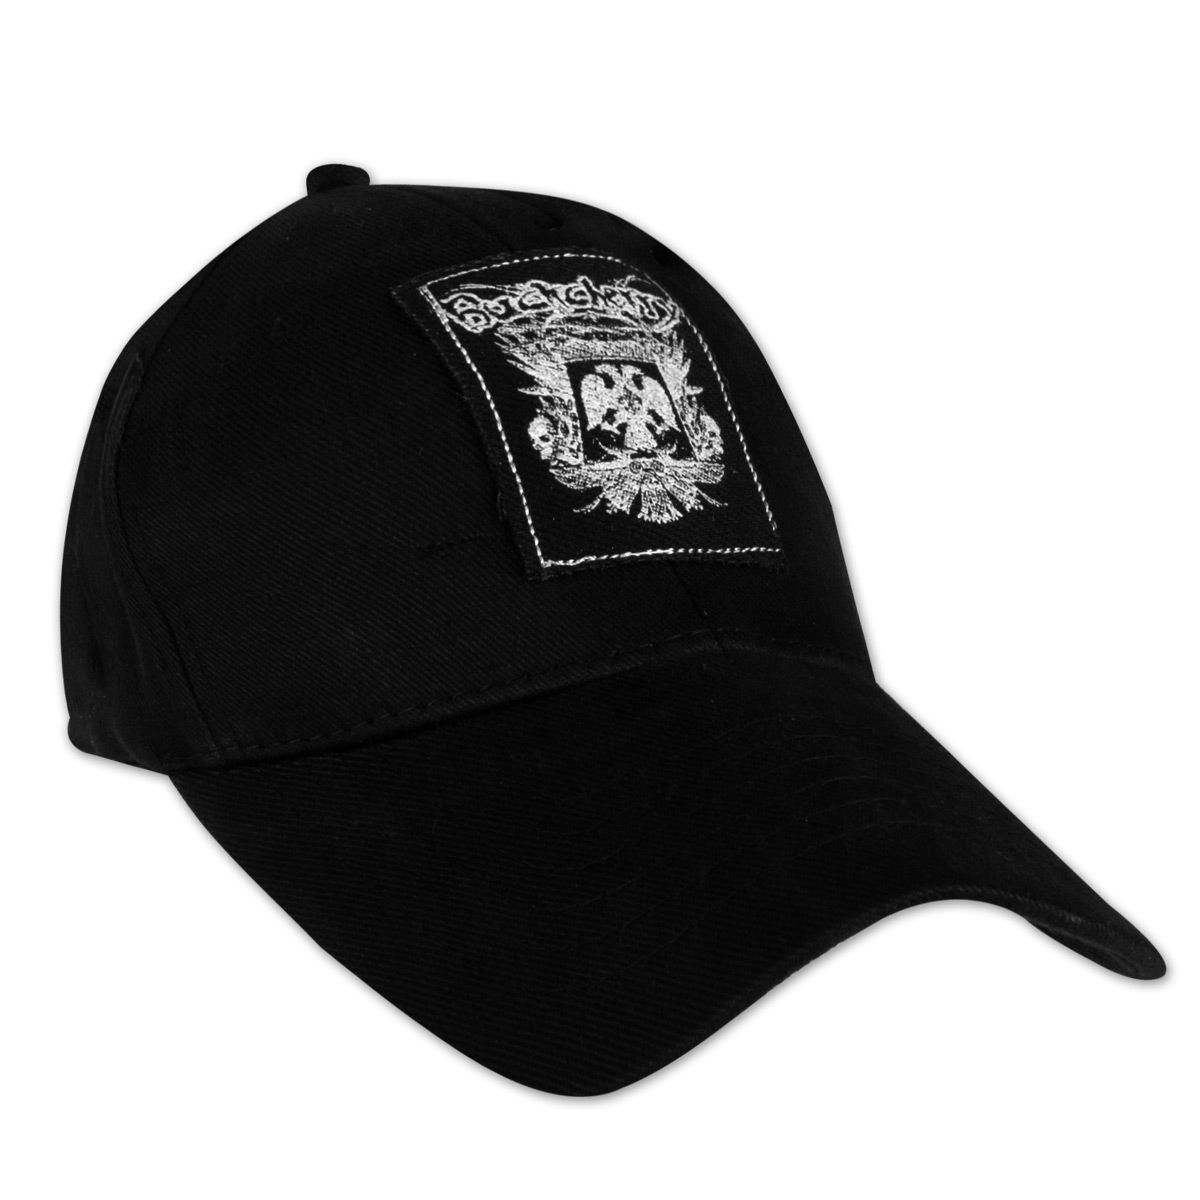 Buckcherry Logo Patch Hat